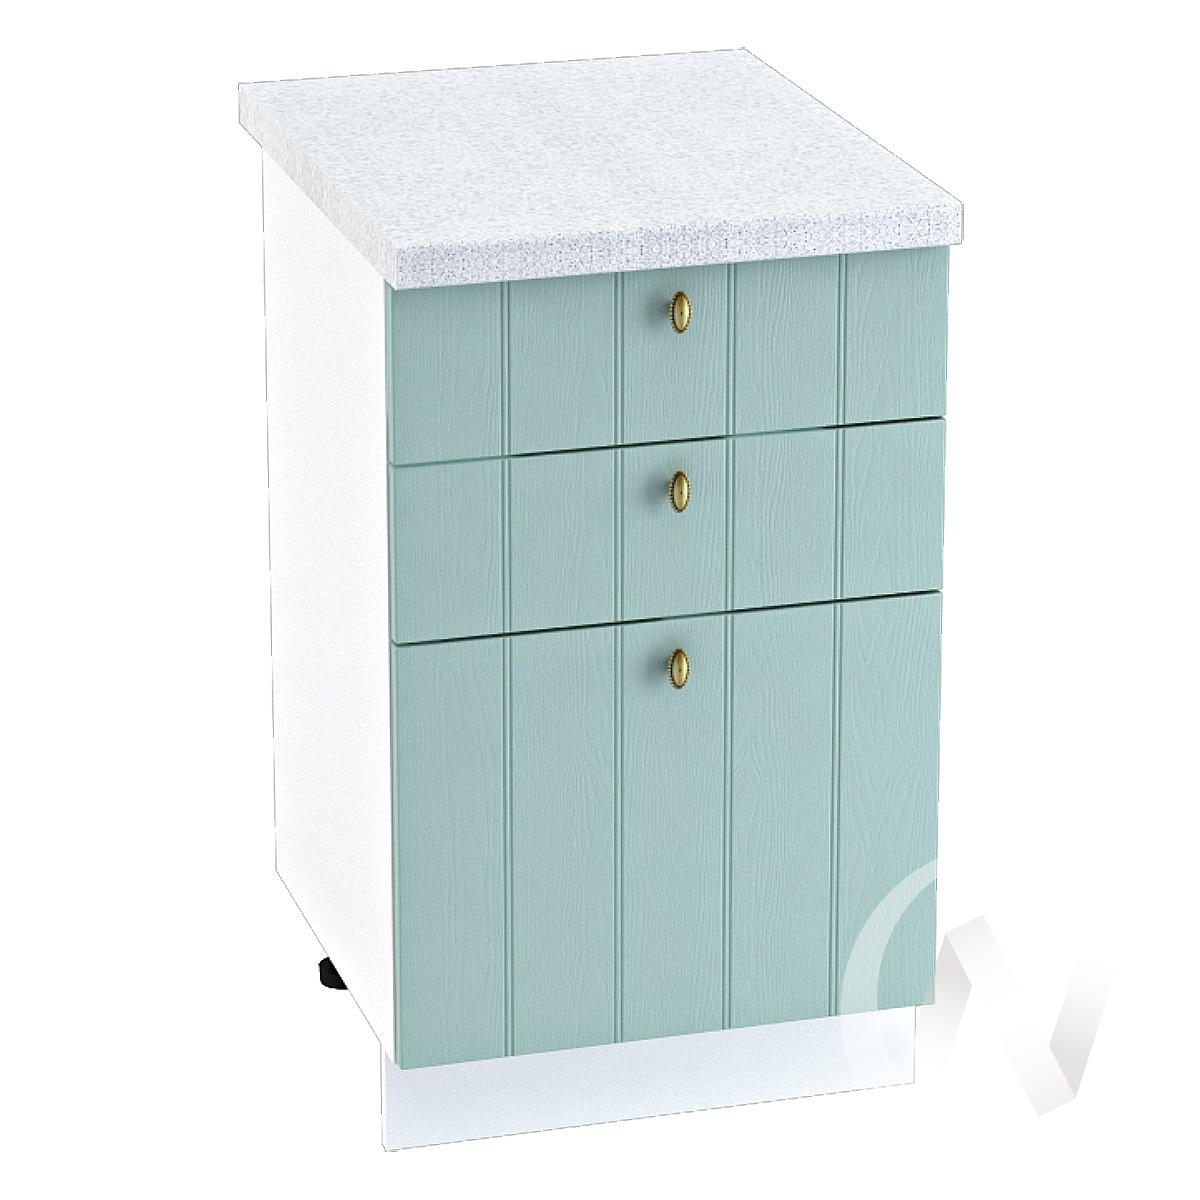 "Кухня ""Прованс"": Шкаф нижний с 3-мя ящиками 500, ШН3Я 500 (голубой/корпус белый)"